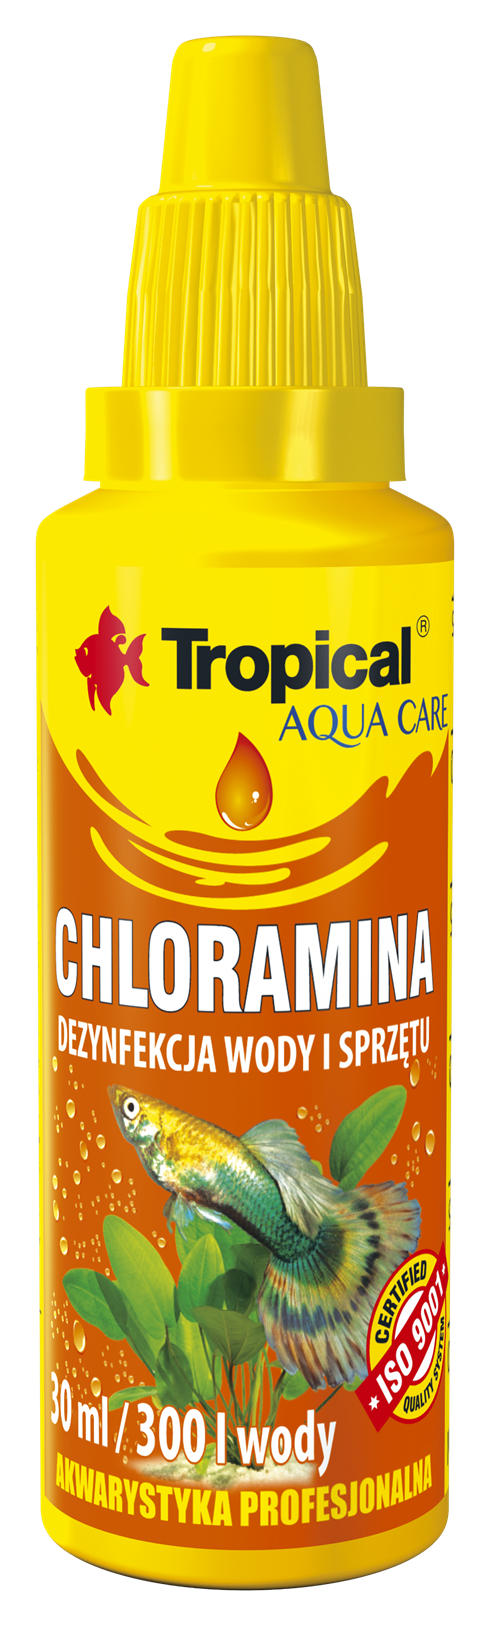 Chloramina